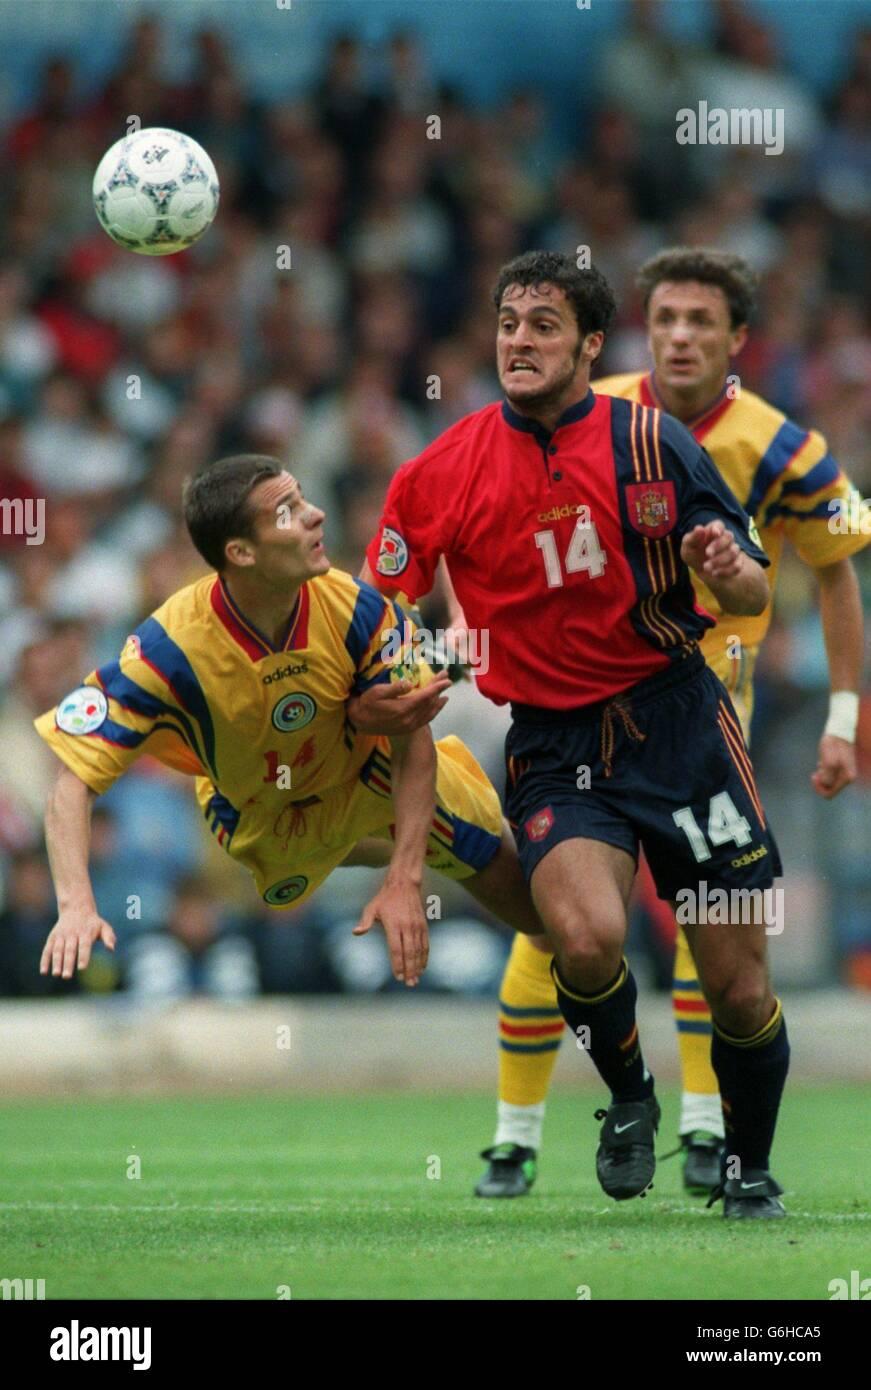 Football - Euro 96 - Roumanie / Espagne Banque D'Images